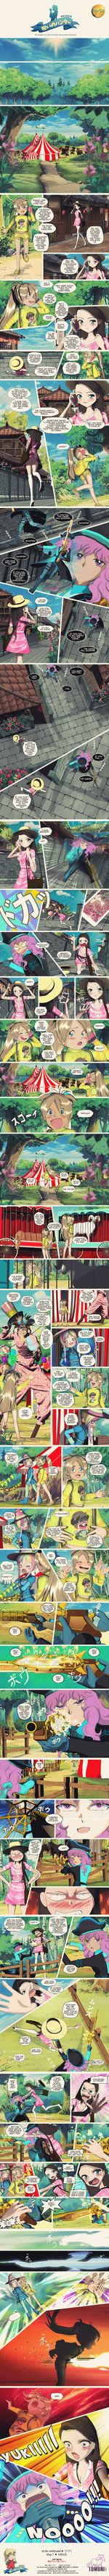 Noroi No Hanta - Page 44-59 by MichiruBokido.deviantart.com on @DeviantArt